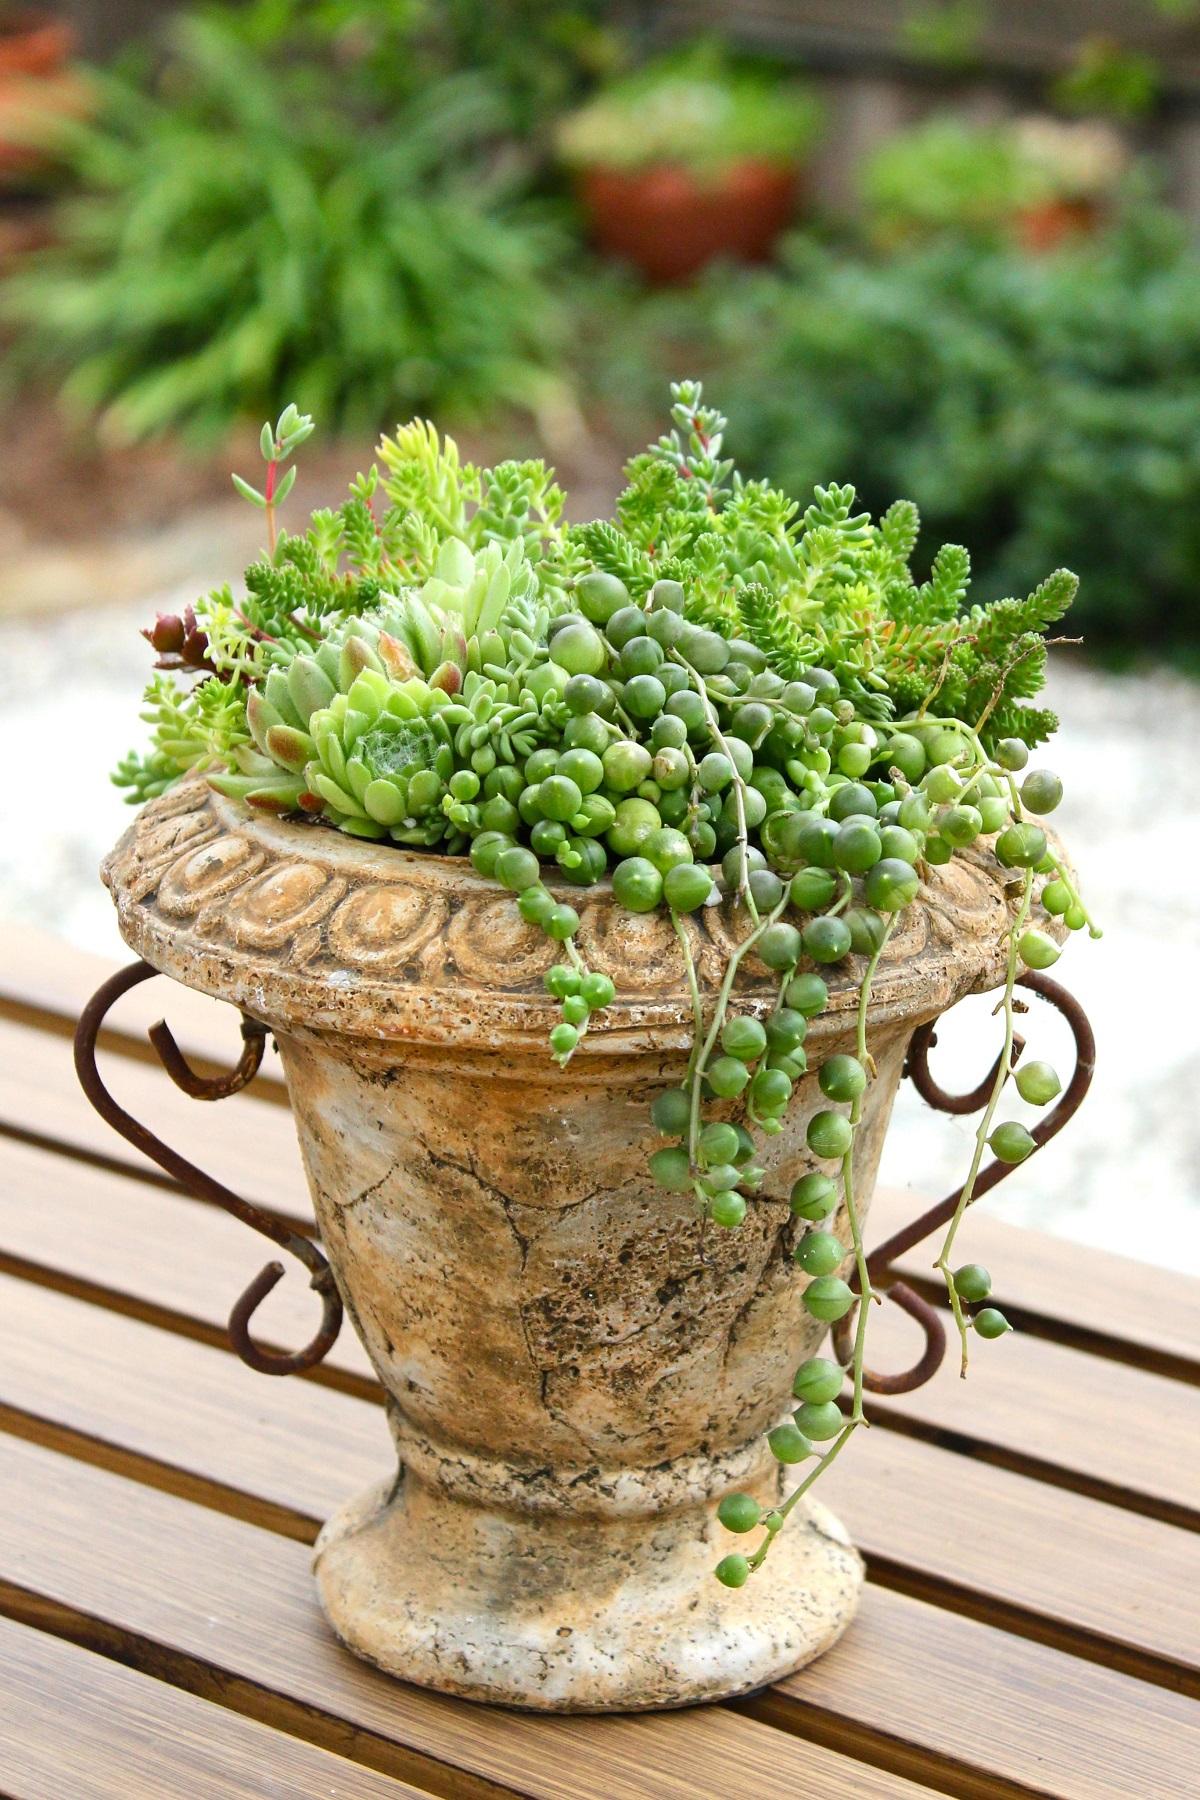 Suculentas uma boa ideia3 decorar jardim